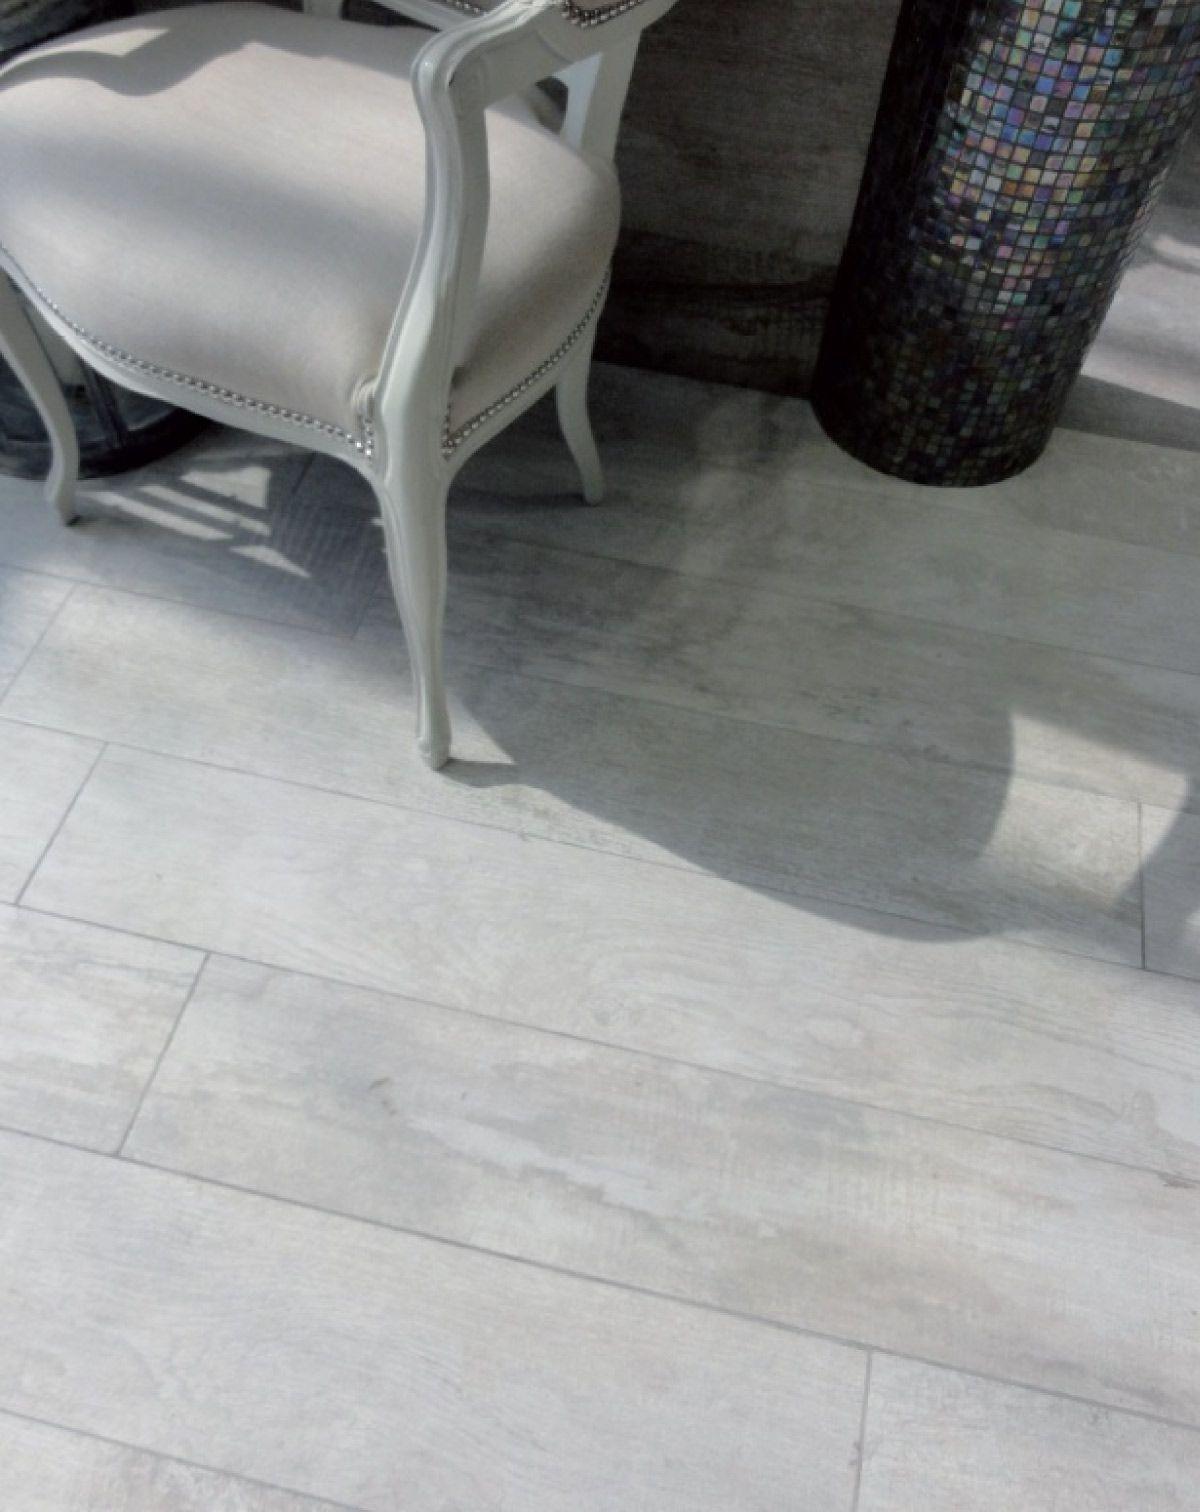 Powergres Fliesen powergres edonwood tile in whitby grey white made to look like